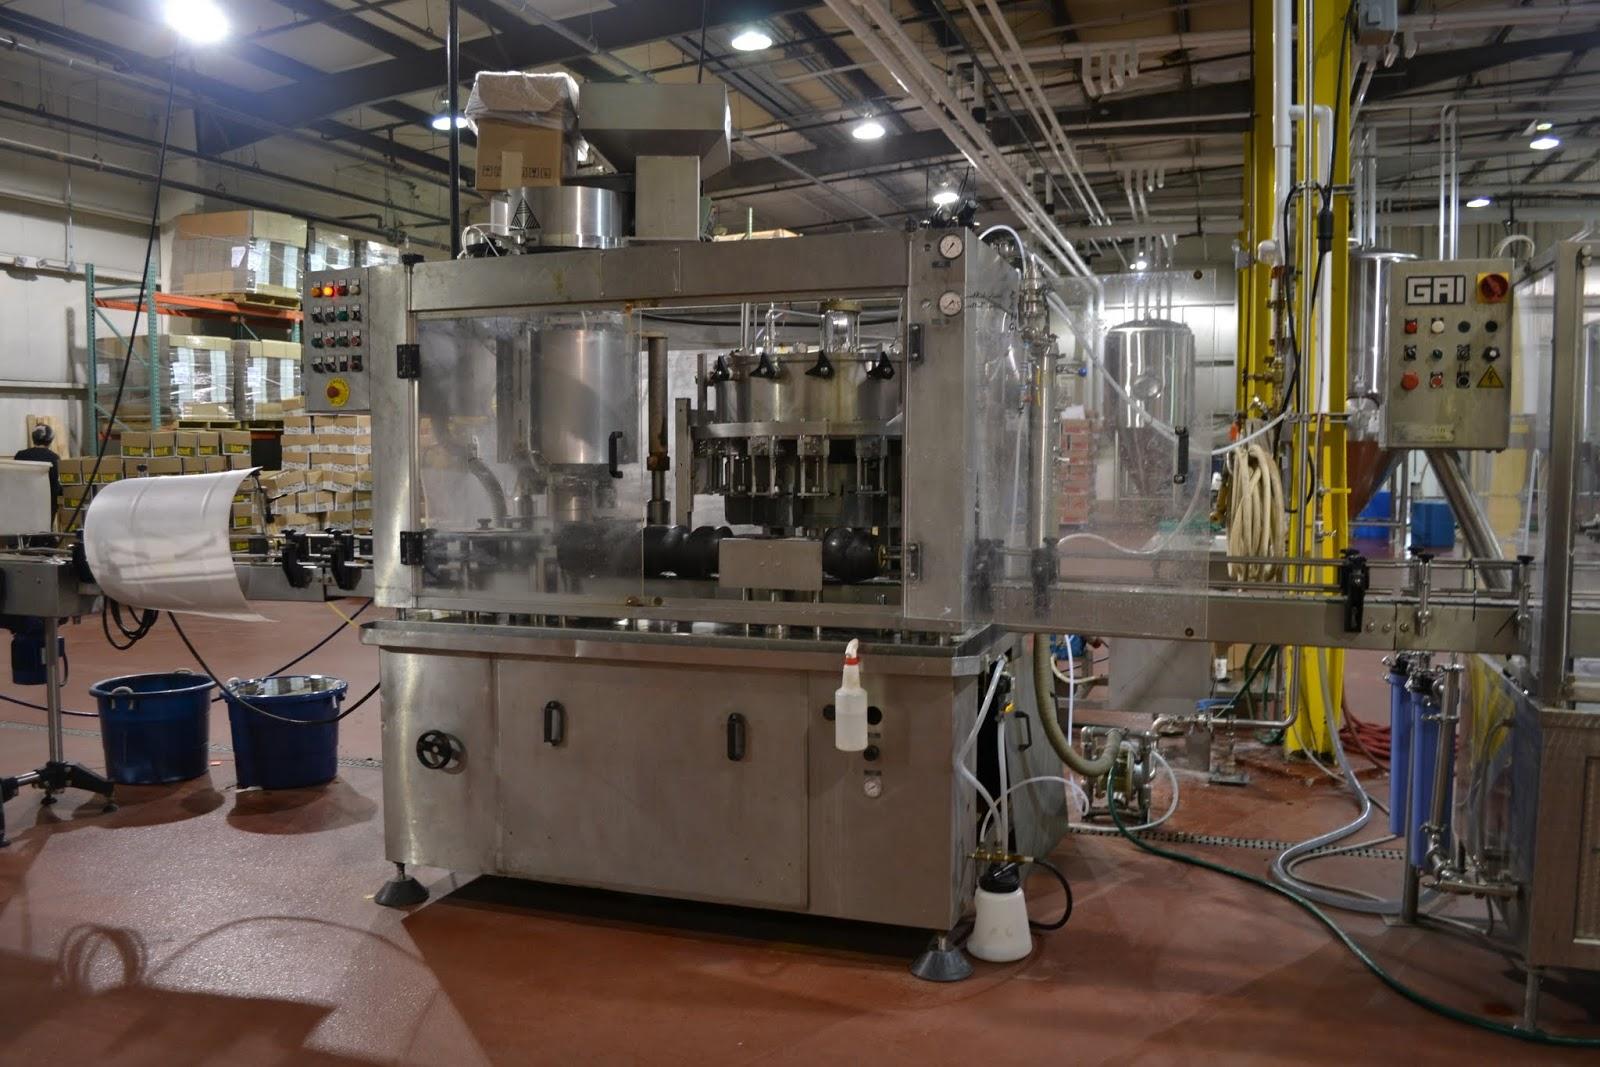 Пивоварня Ривер Хорс (River Horse Brewery, Ewing, NJ)